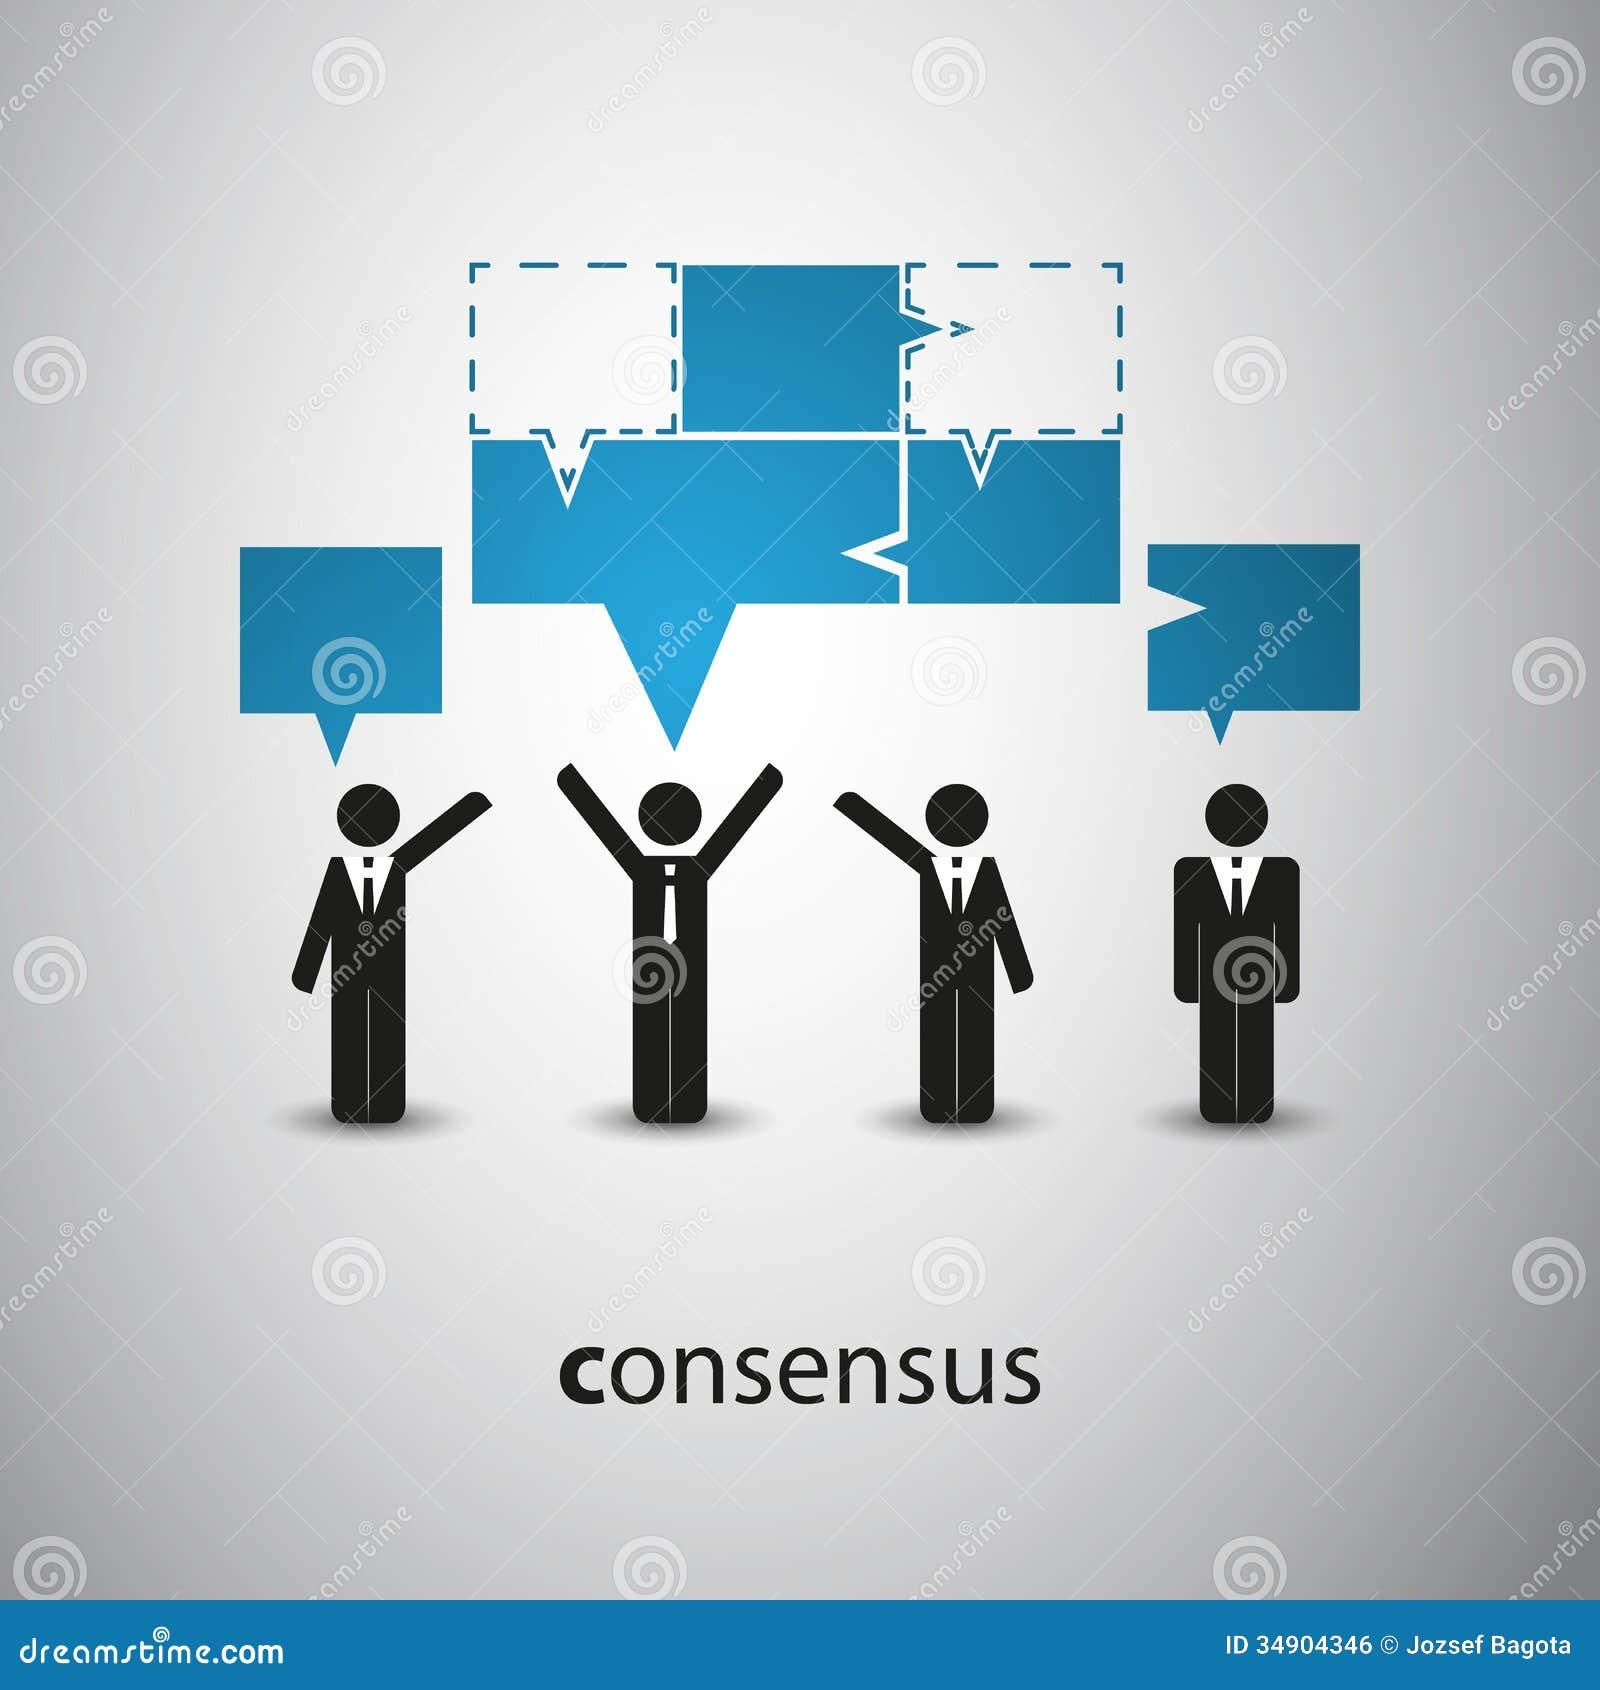 Consensus - Speech Bubble Concept Royalty Free Stock Image ...